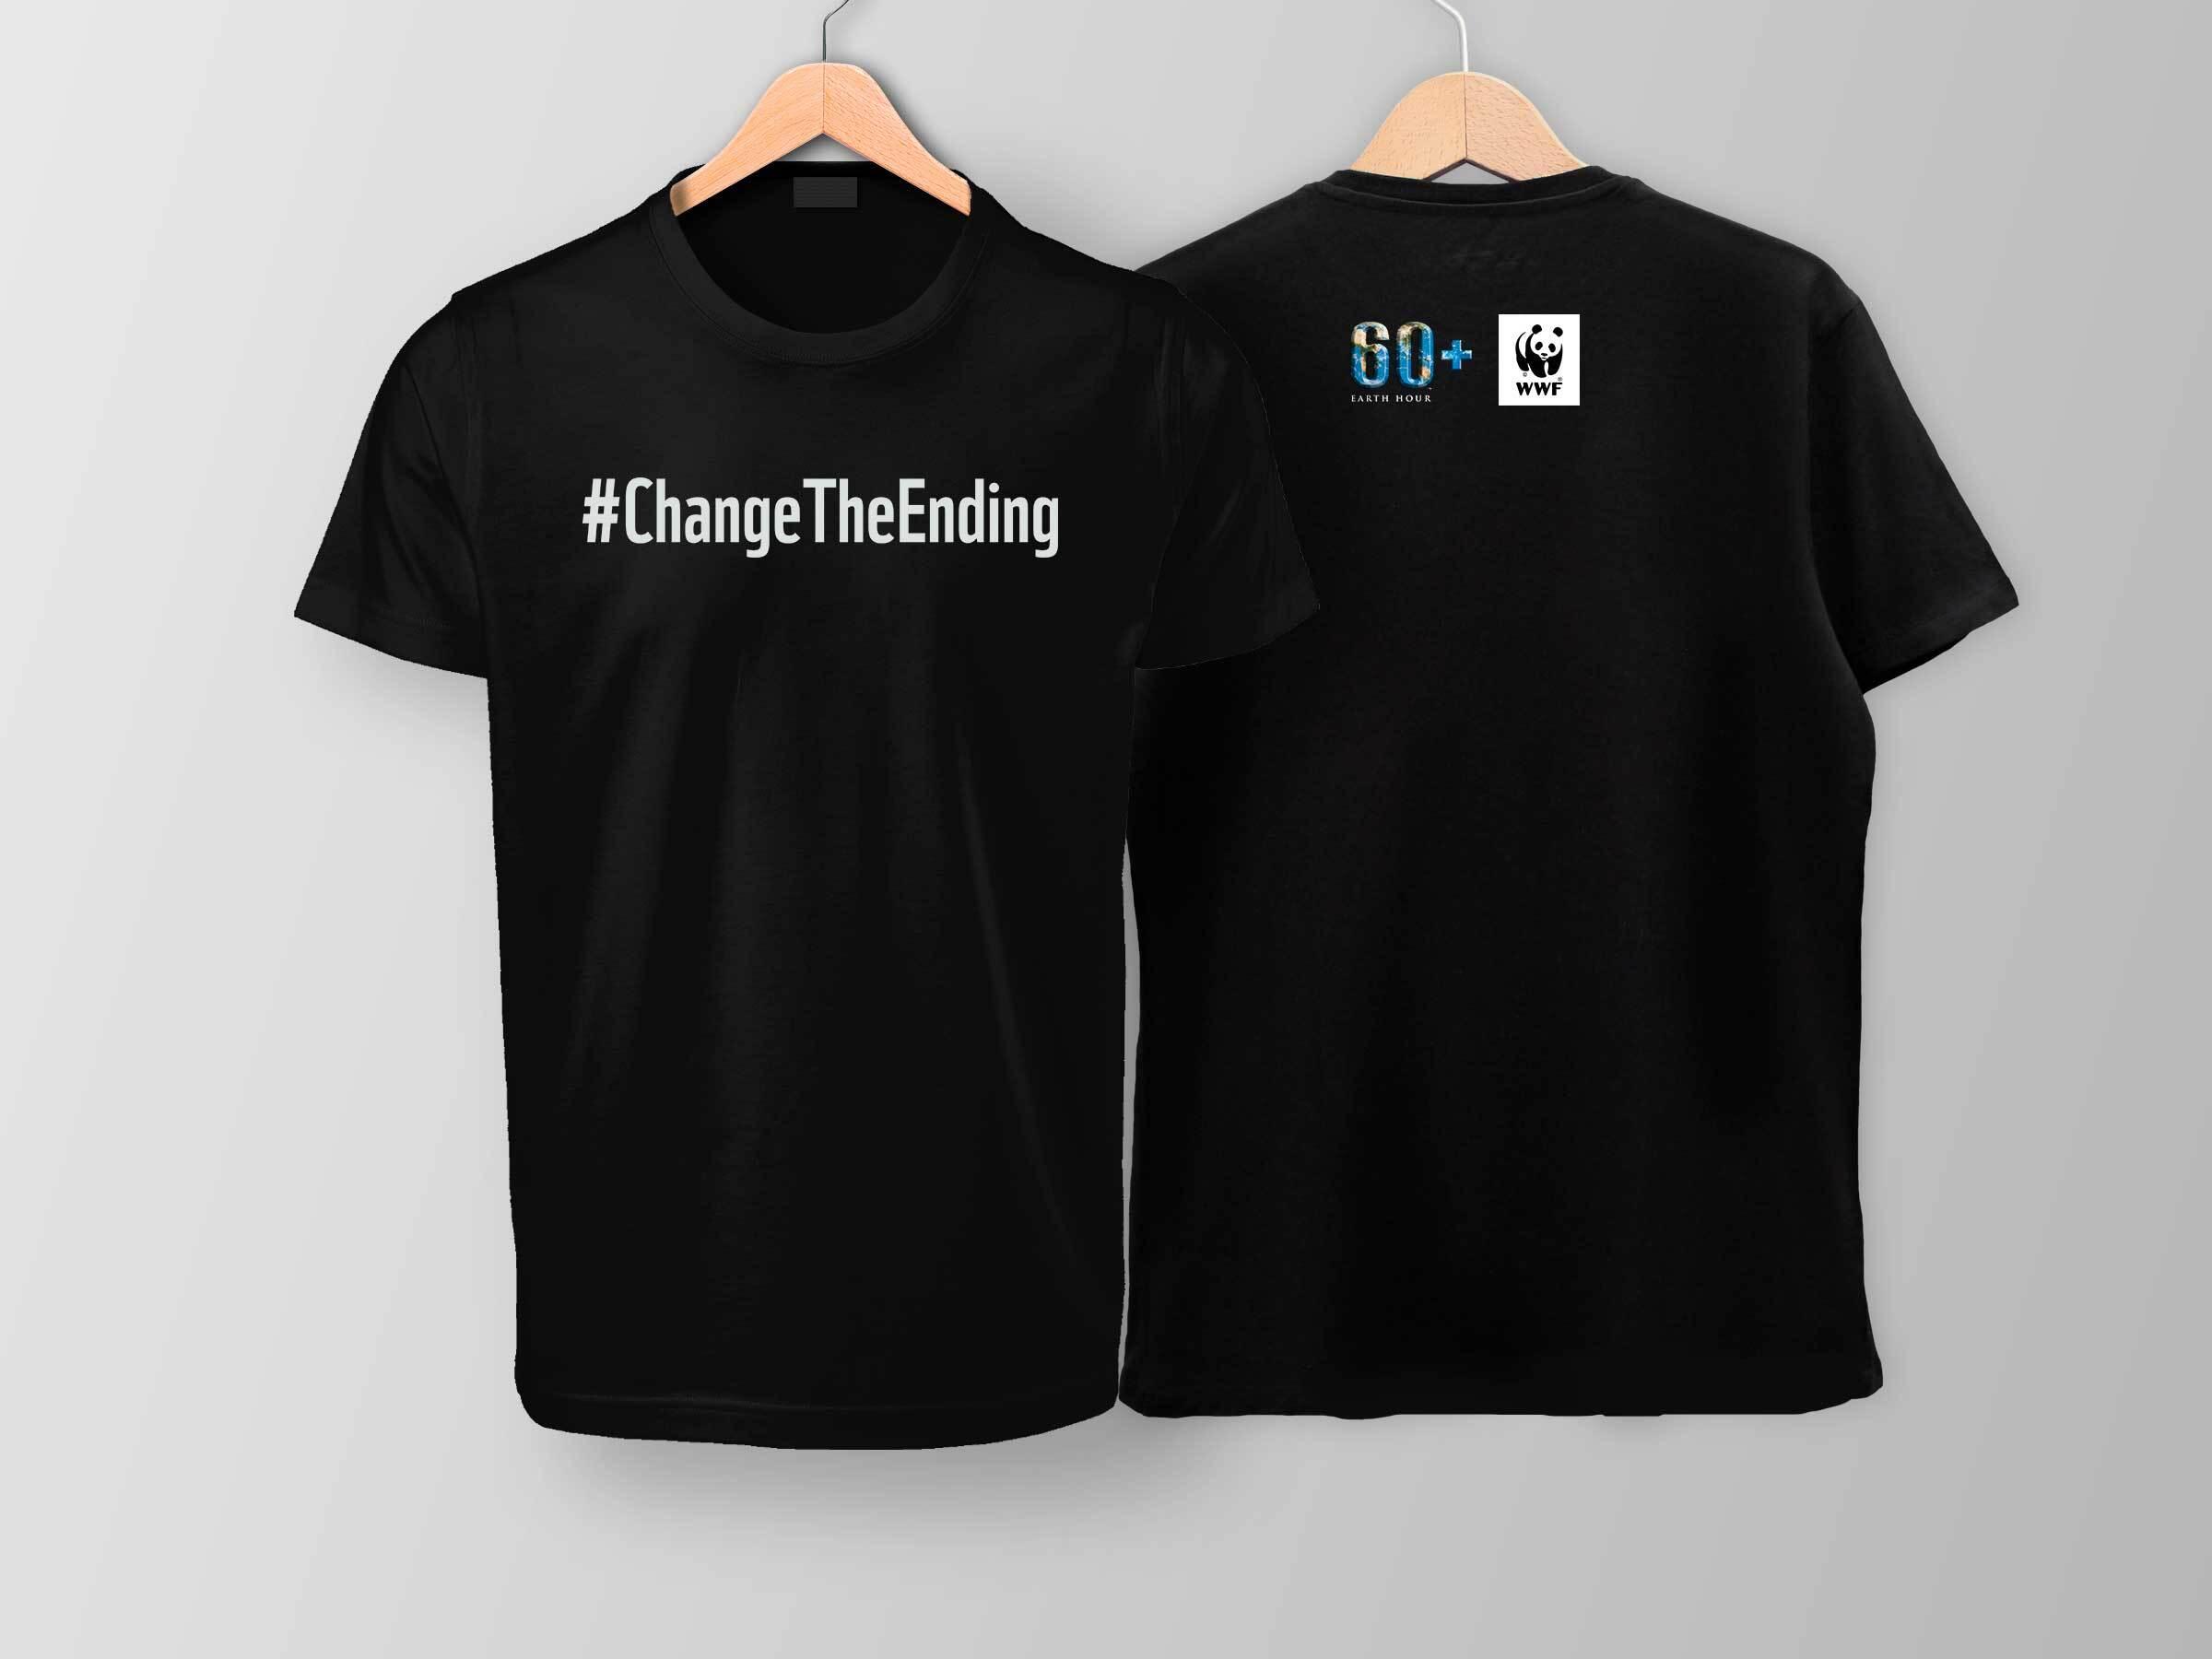 1eh2020 Shirt Hashtag Mockup On Black 1